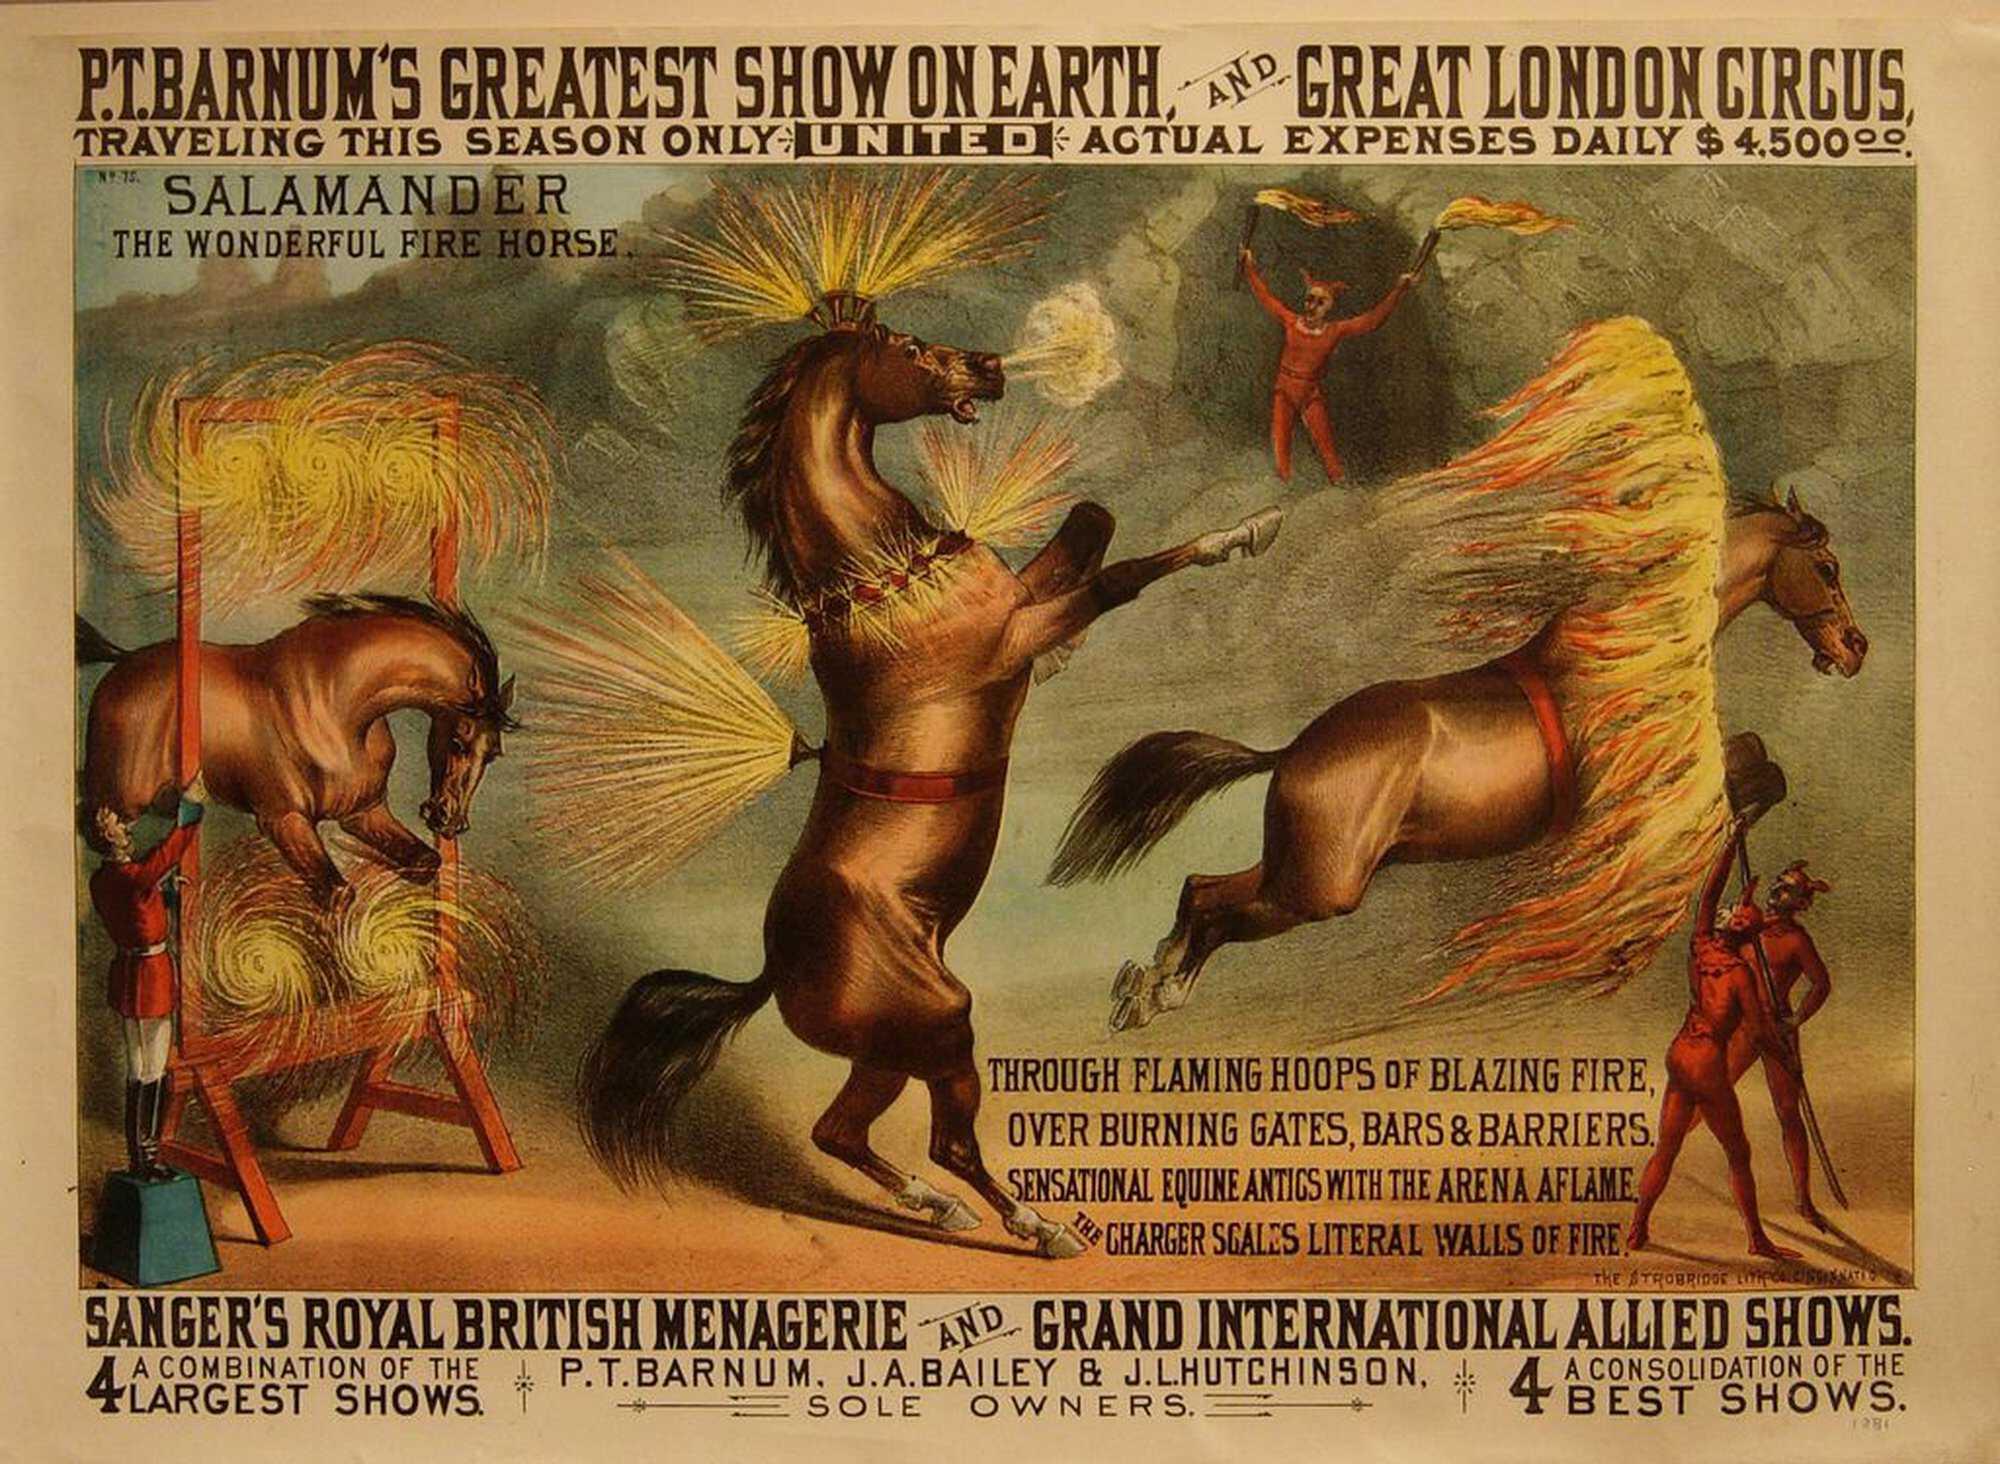 Circus-Animals-SalamanderFire-Horse.jpg